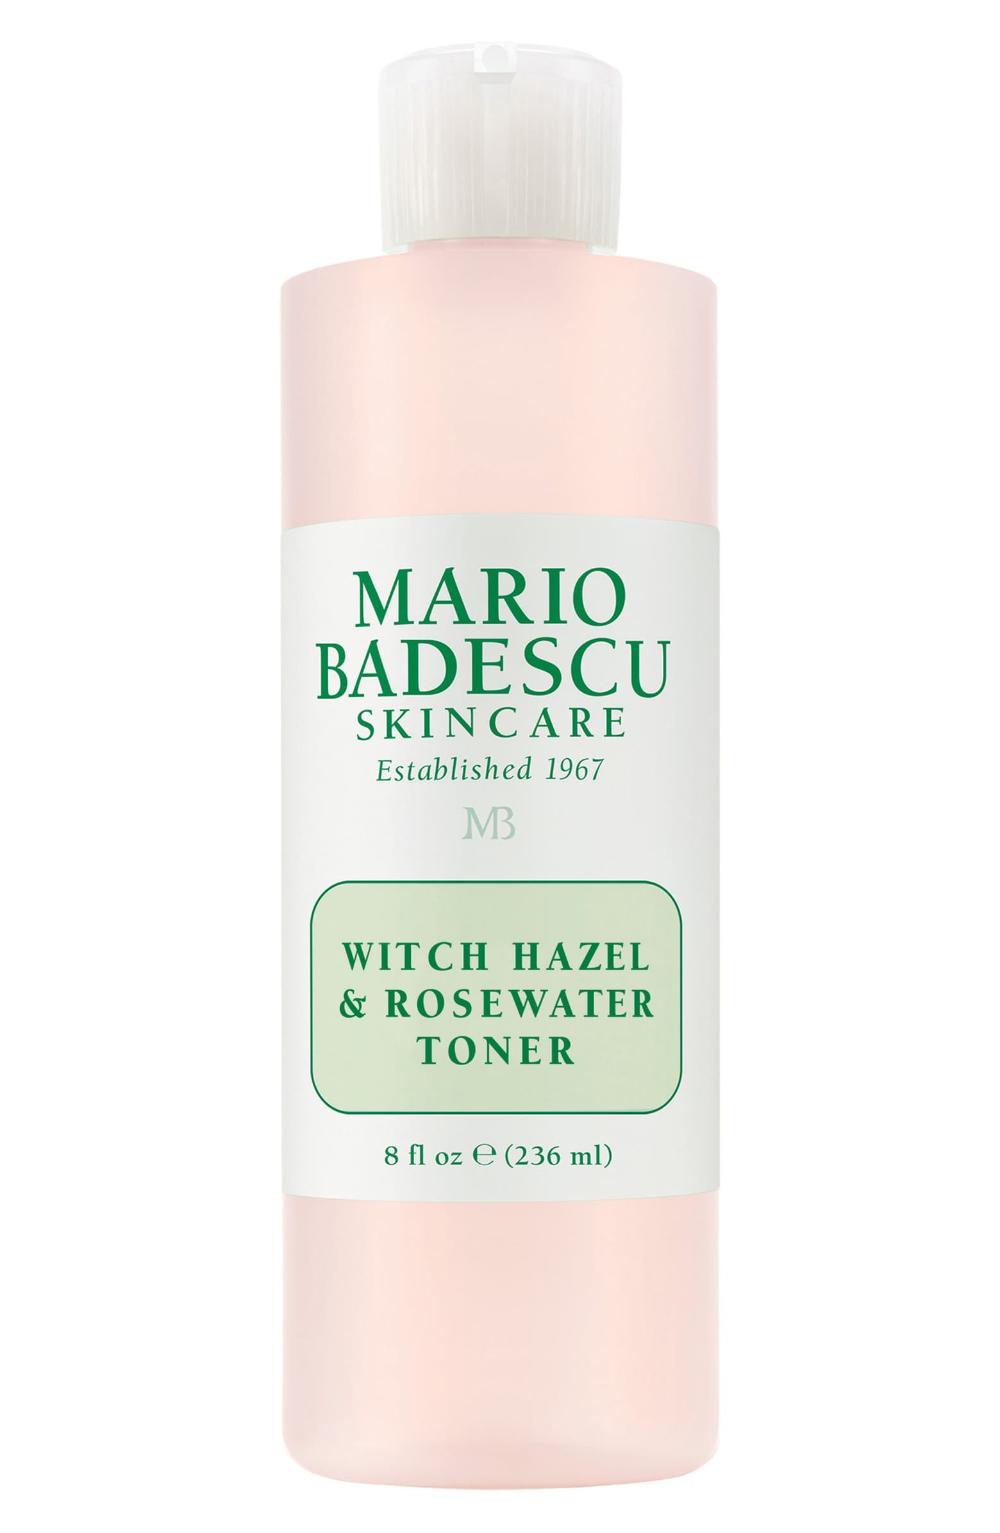 Mario Badescu Witch Hazel Rosewater Toner Nordstrom Rose Water Toner Skin Care Mario Badescu